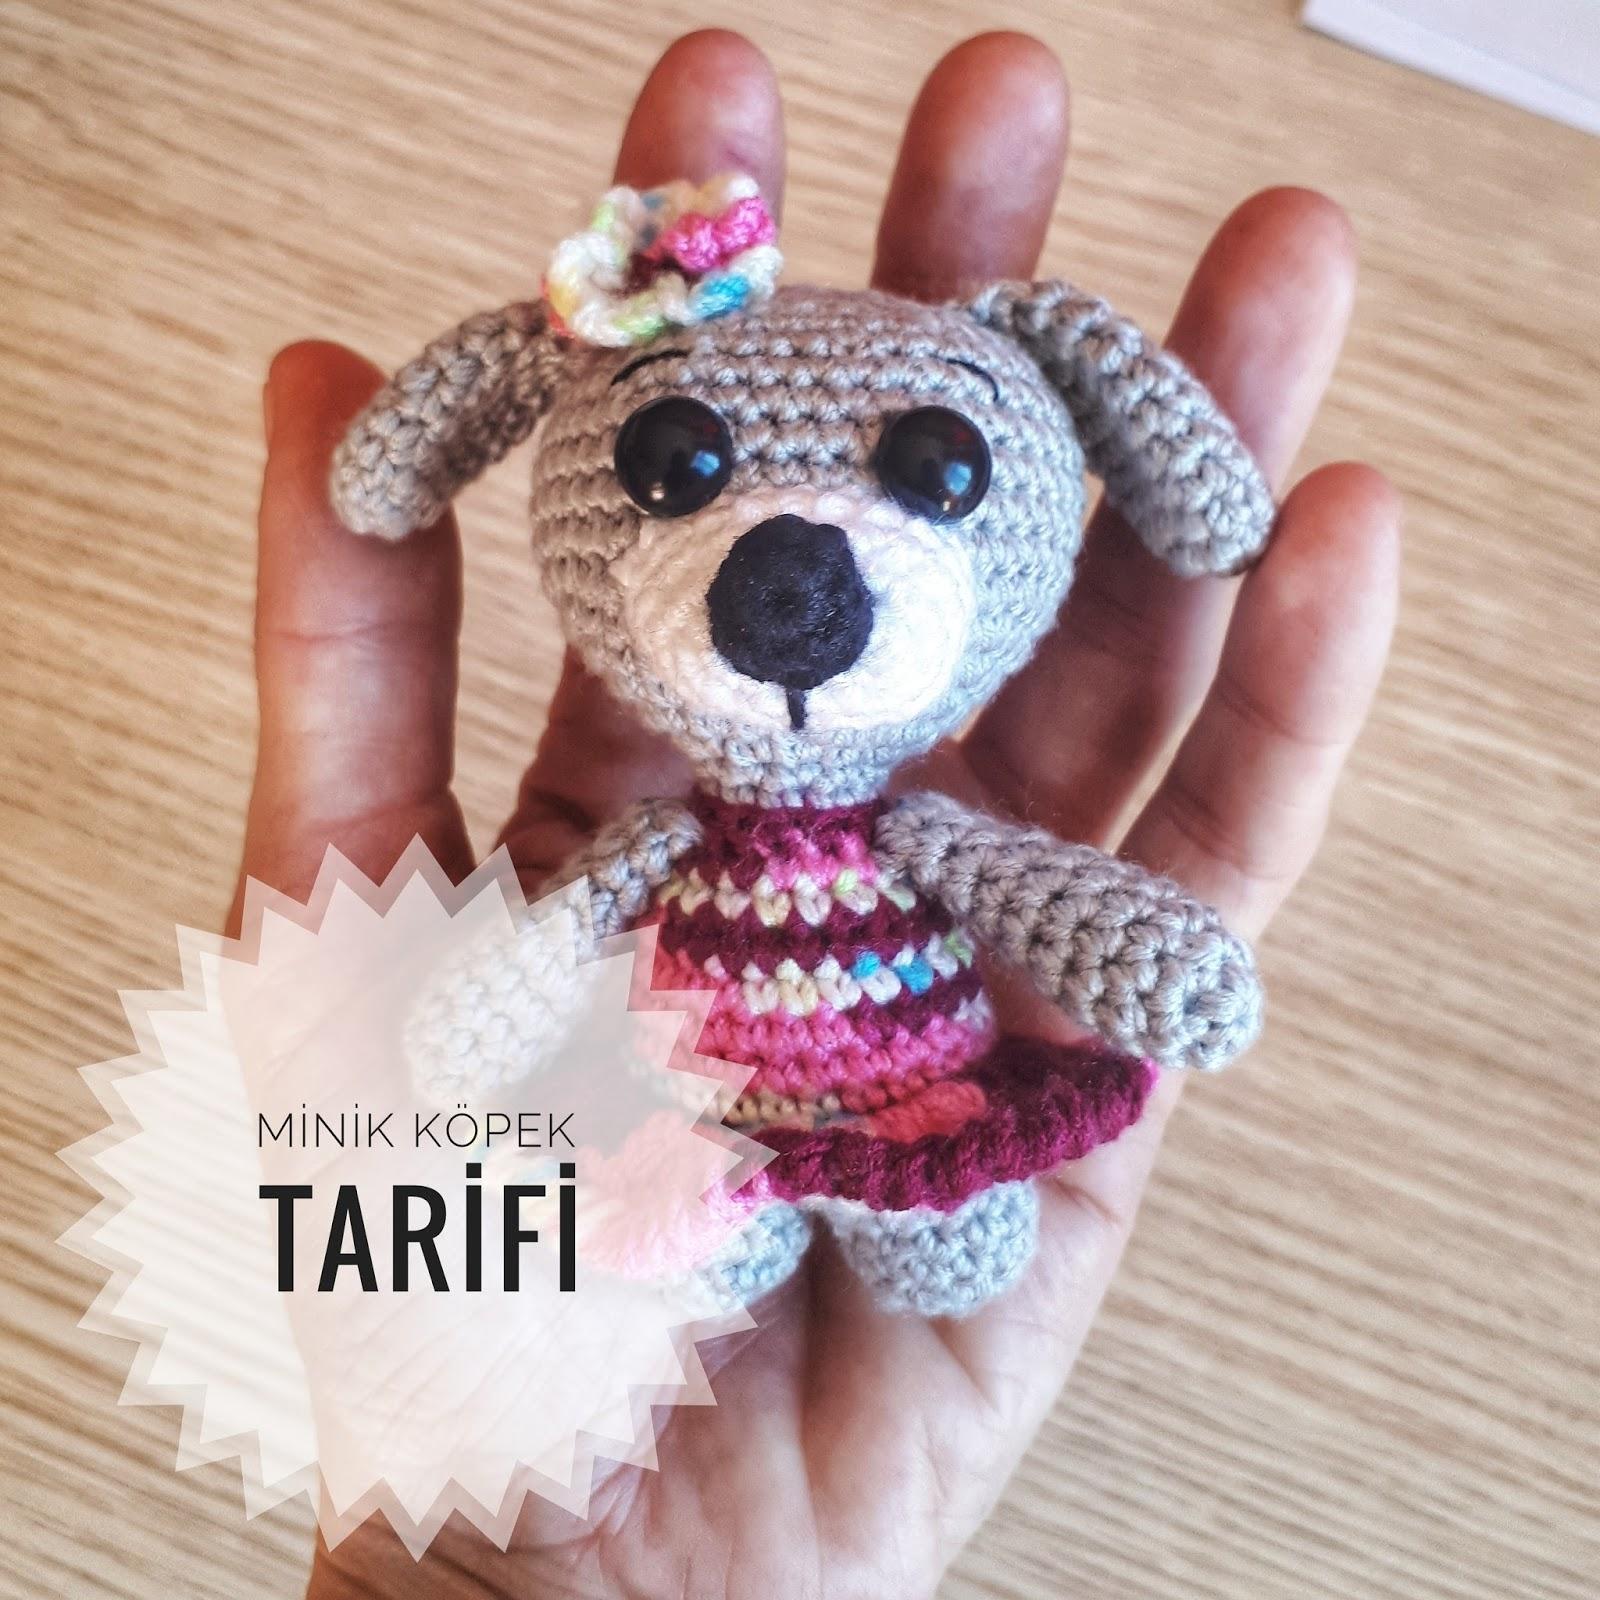 Amigurumi Crochet Lantern Skirt for Doll Pig - Crochet.msa.plus | 1600x1600